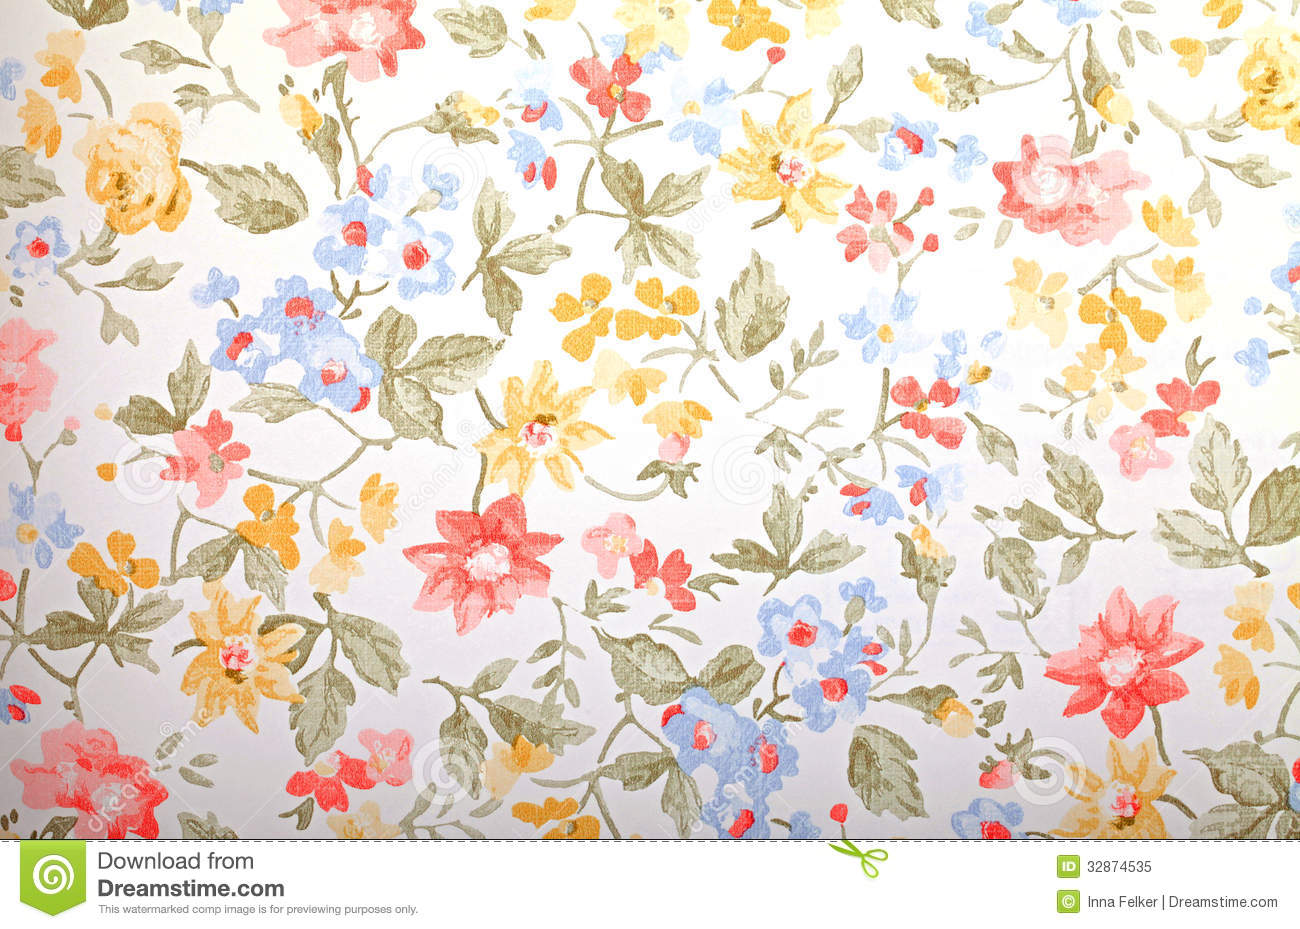 Vintage Flower Pattern Wallpaper Vintage provan 1300x929